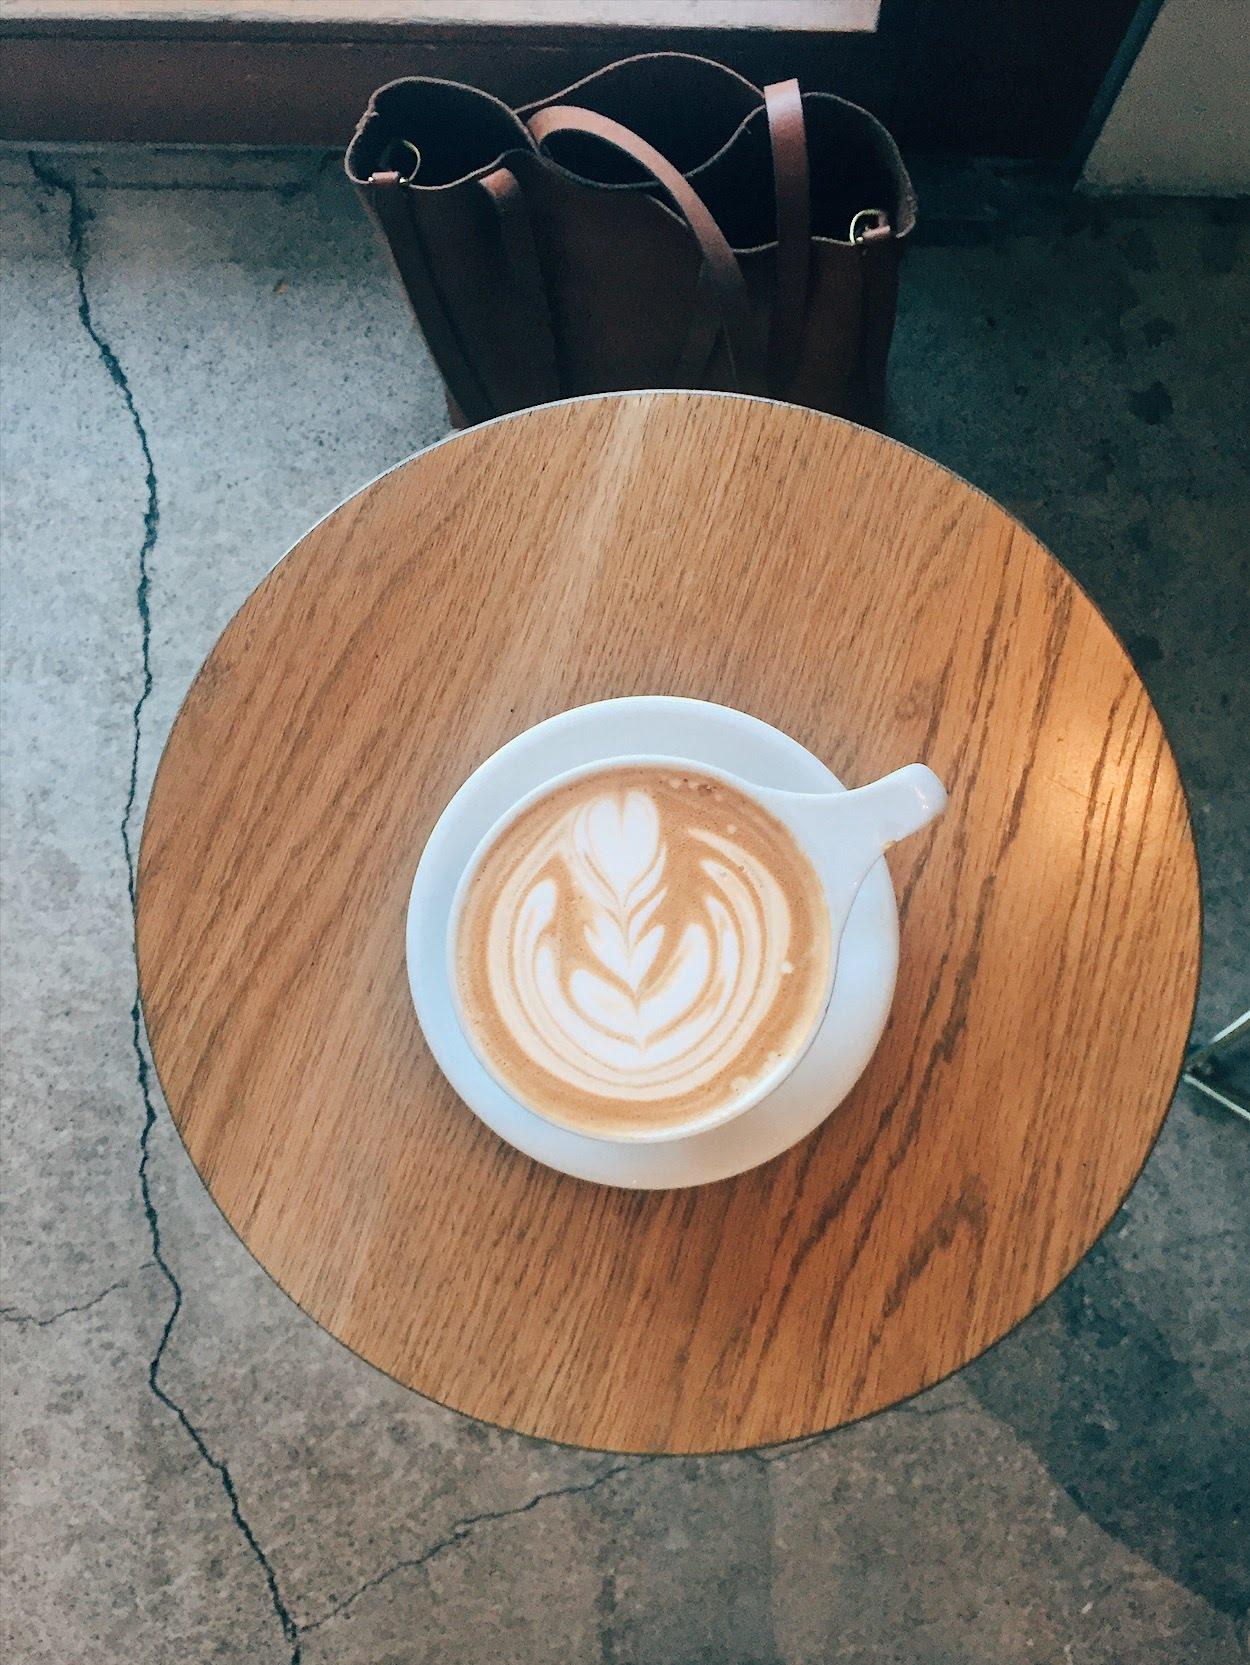 latte art at kit coffee in newport beach, california